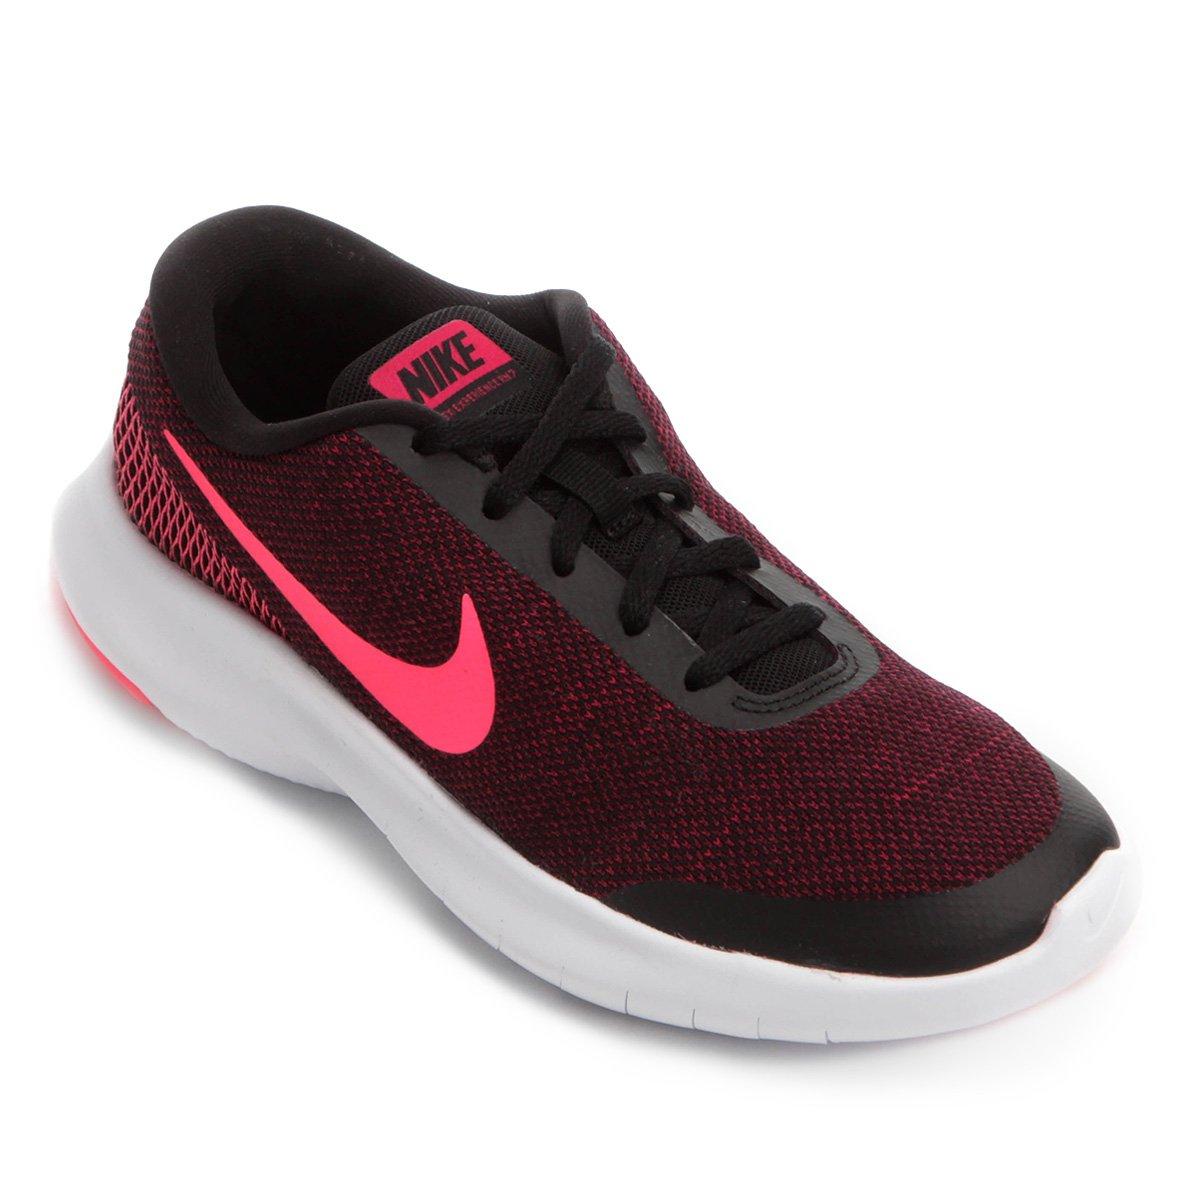 593210130a Tênis Nike Flex Experience RN 7 Feminino - Preto e Rosa - Compre ...